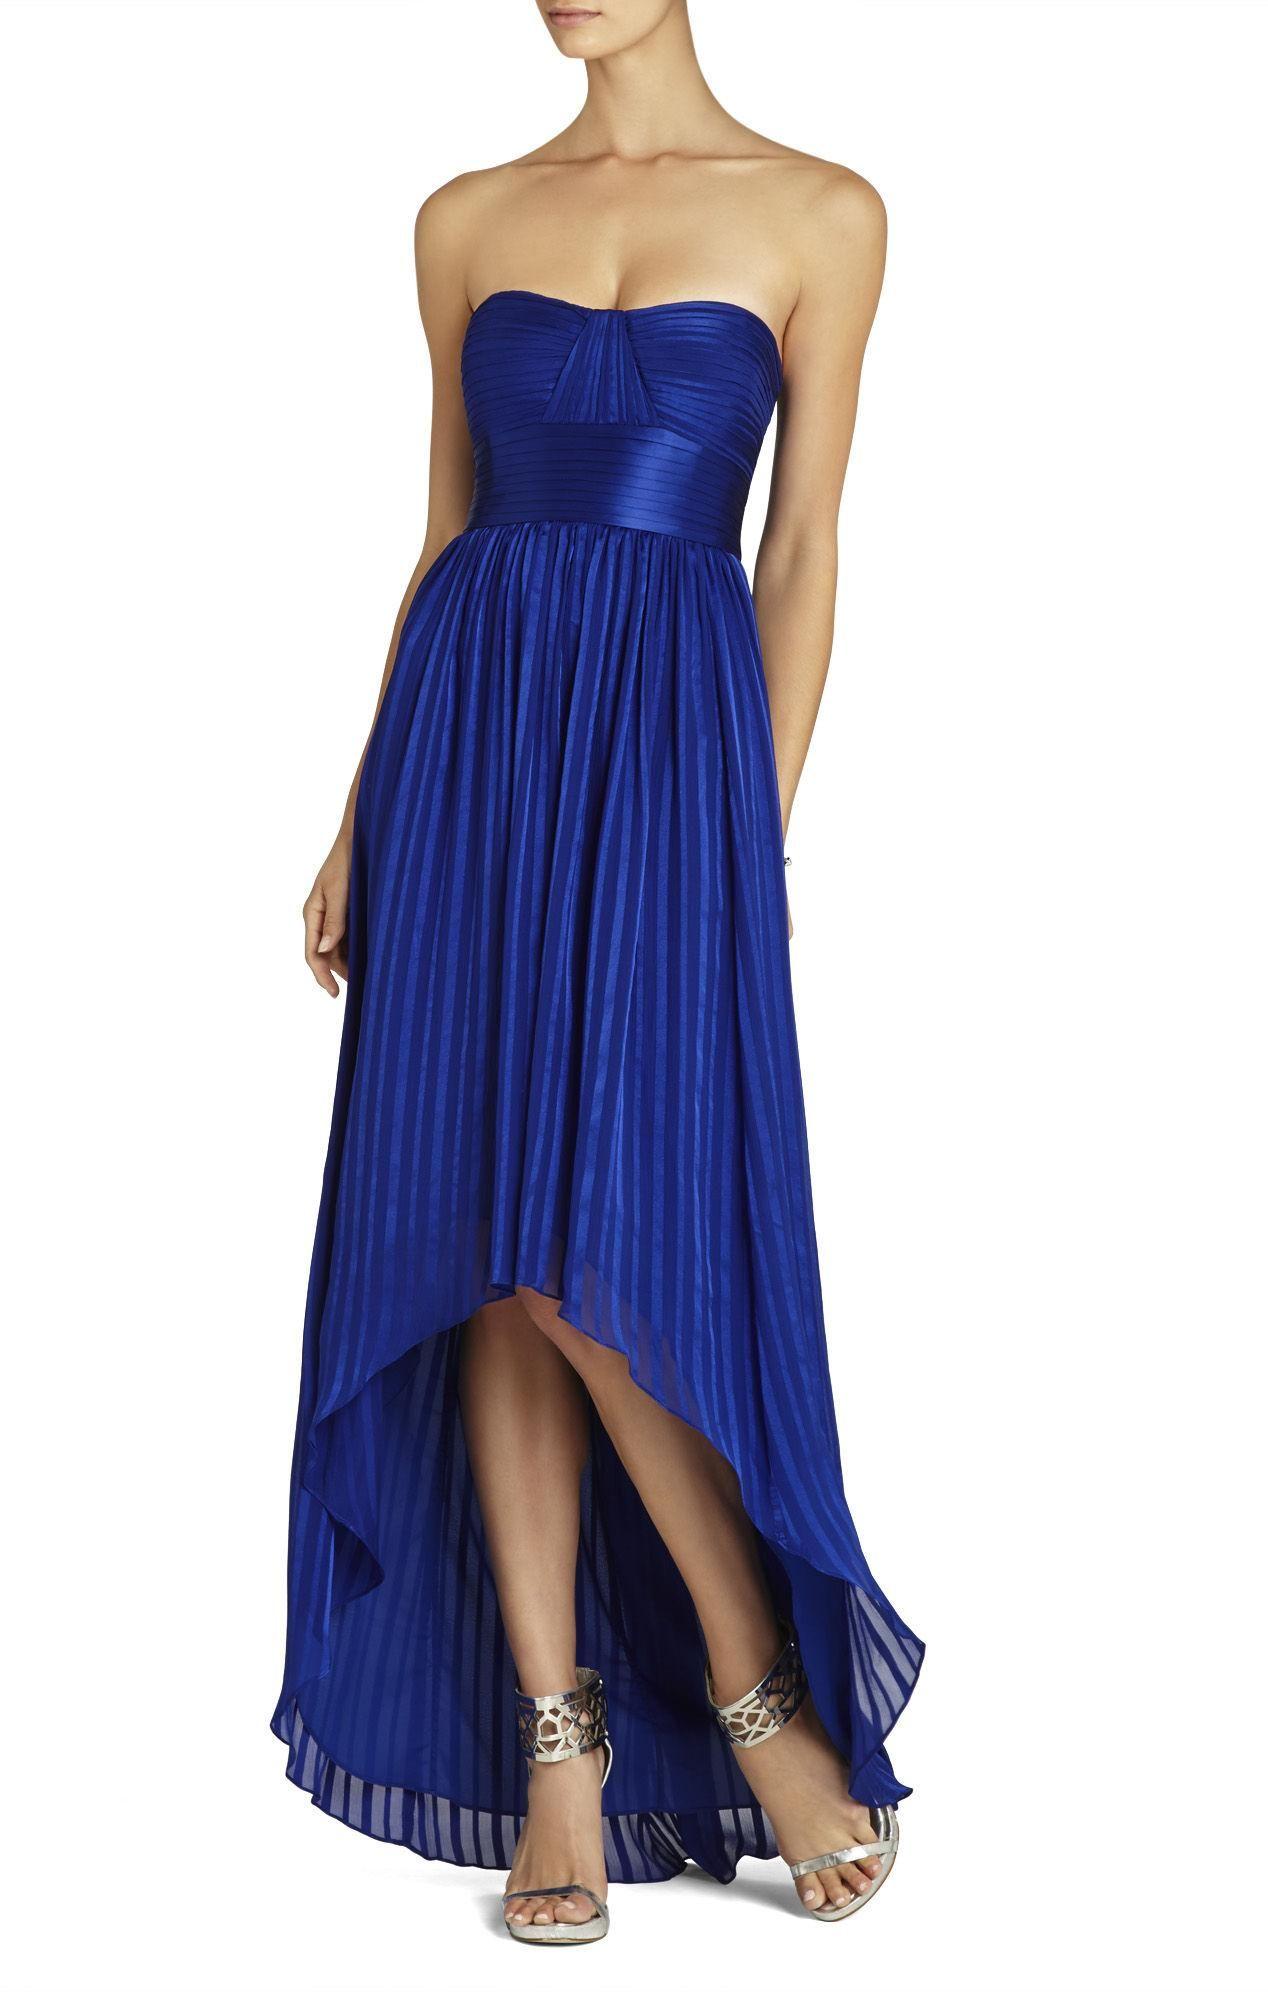 Pin by camila chacoff garay on fashion pinterest royal blue